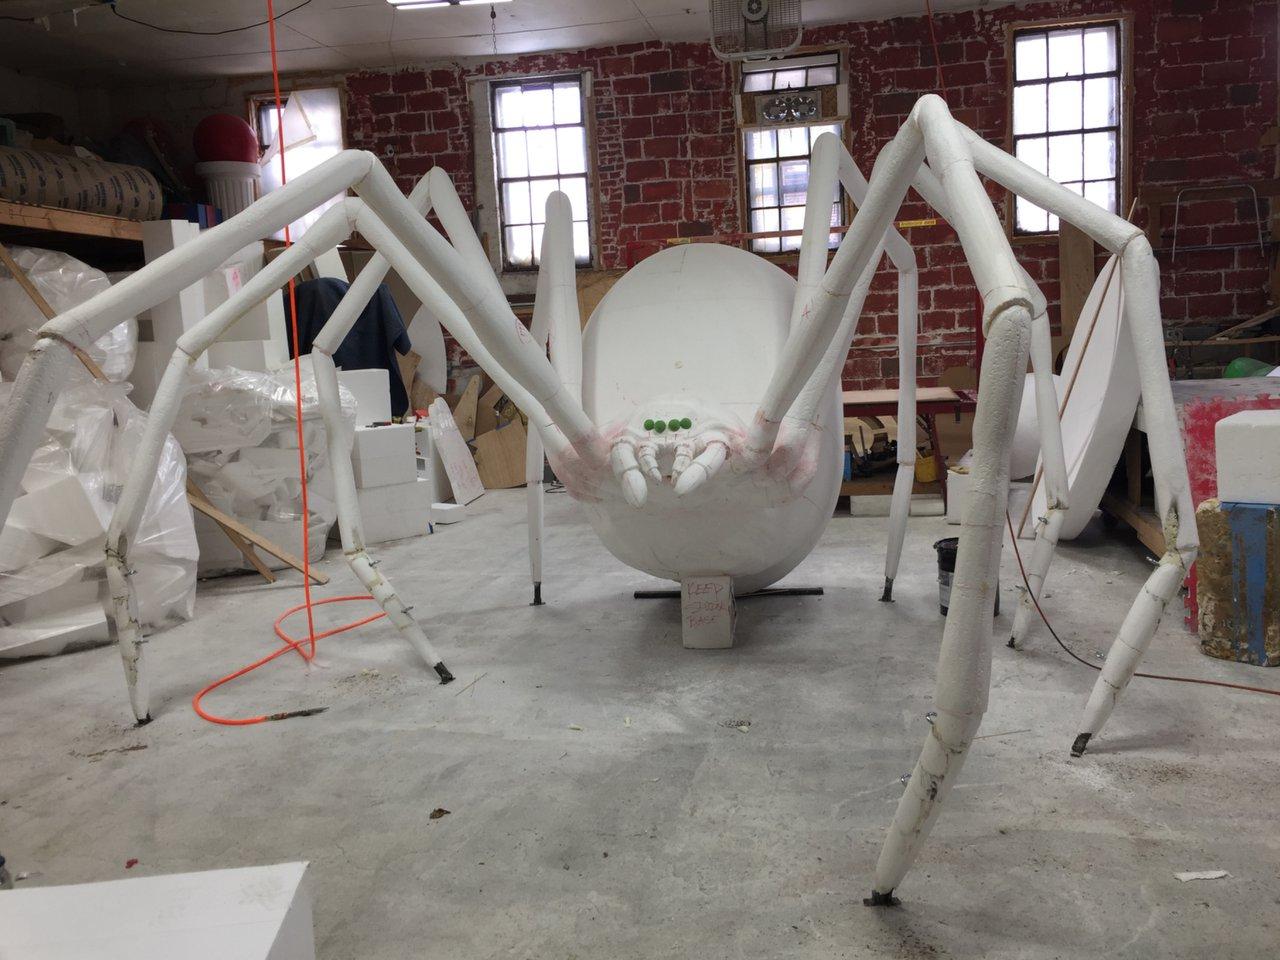 GIGANTIC Black Widow Spider Sculpt photo 0D561A35-8DA6-464C-ABA1-401D251C686D.jpg